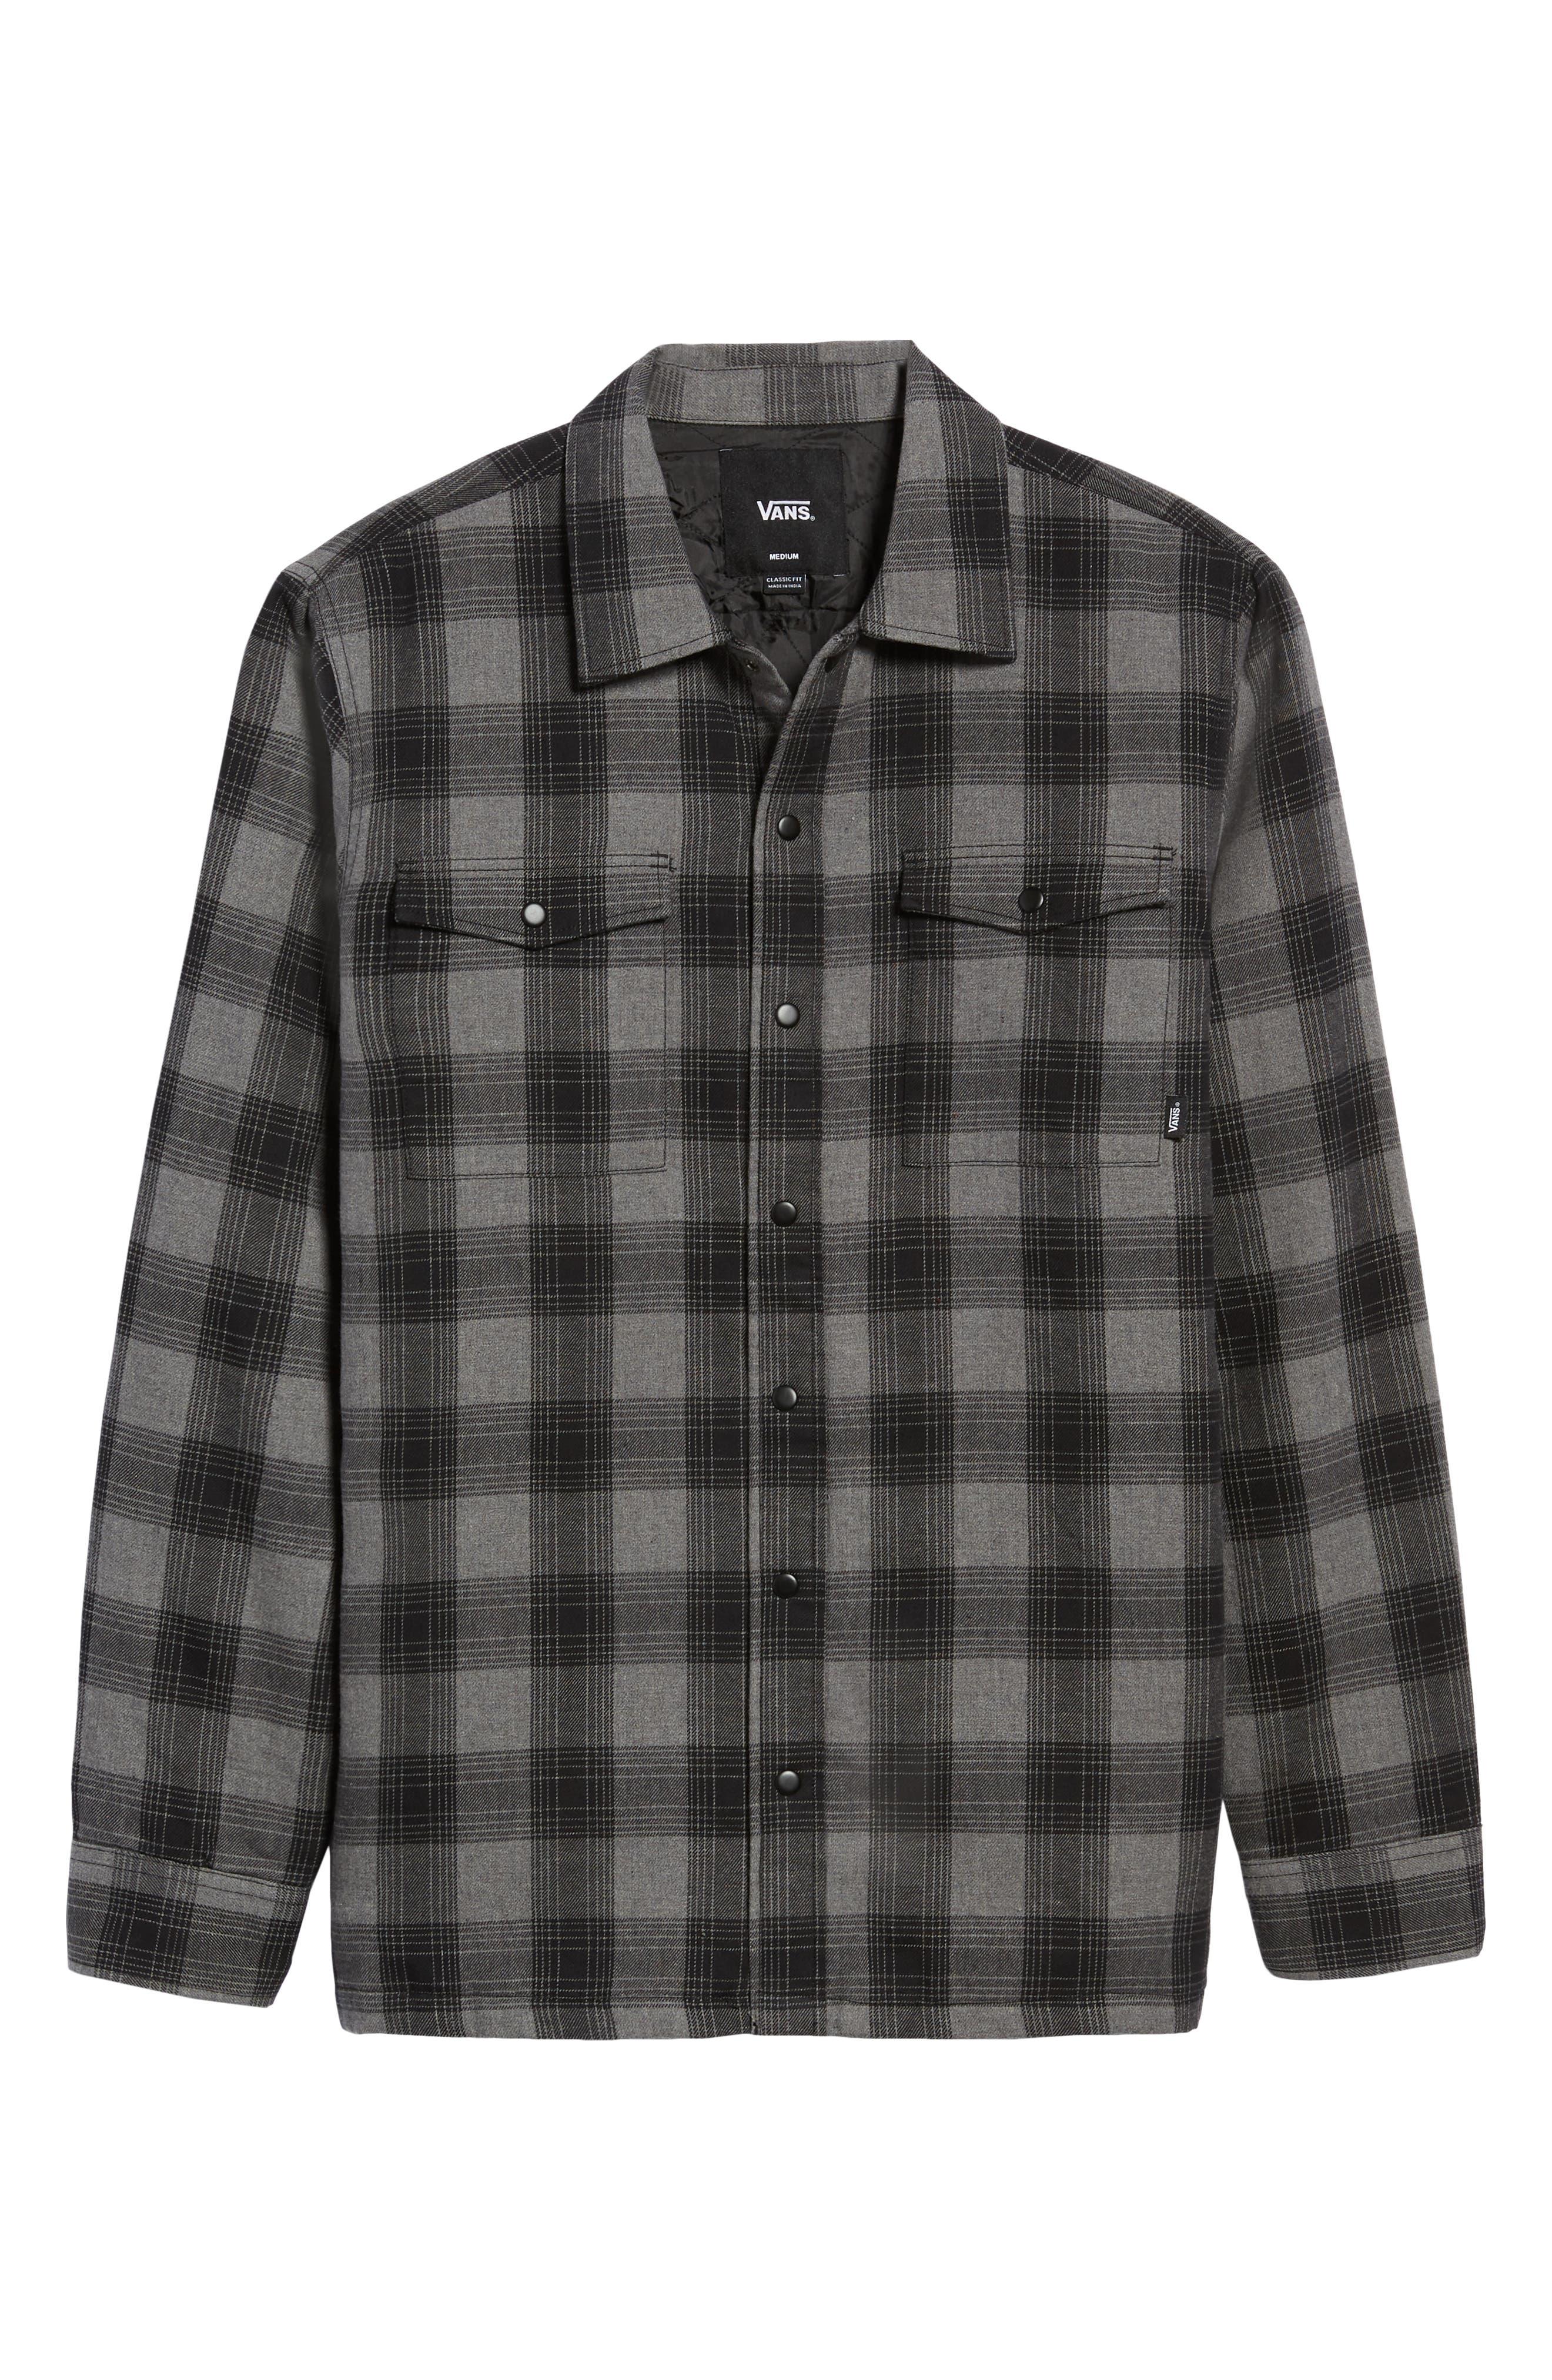 VANS,                             Parnell Plaid Shirt Jacket,                             Alternate thumbnail 6, color,                             GRAVEL HEATHER